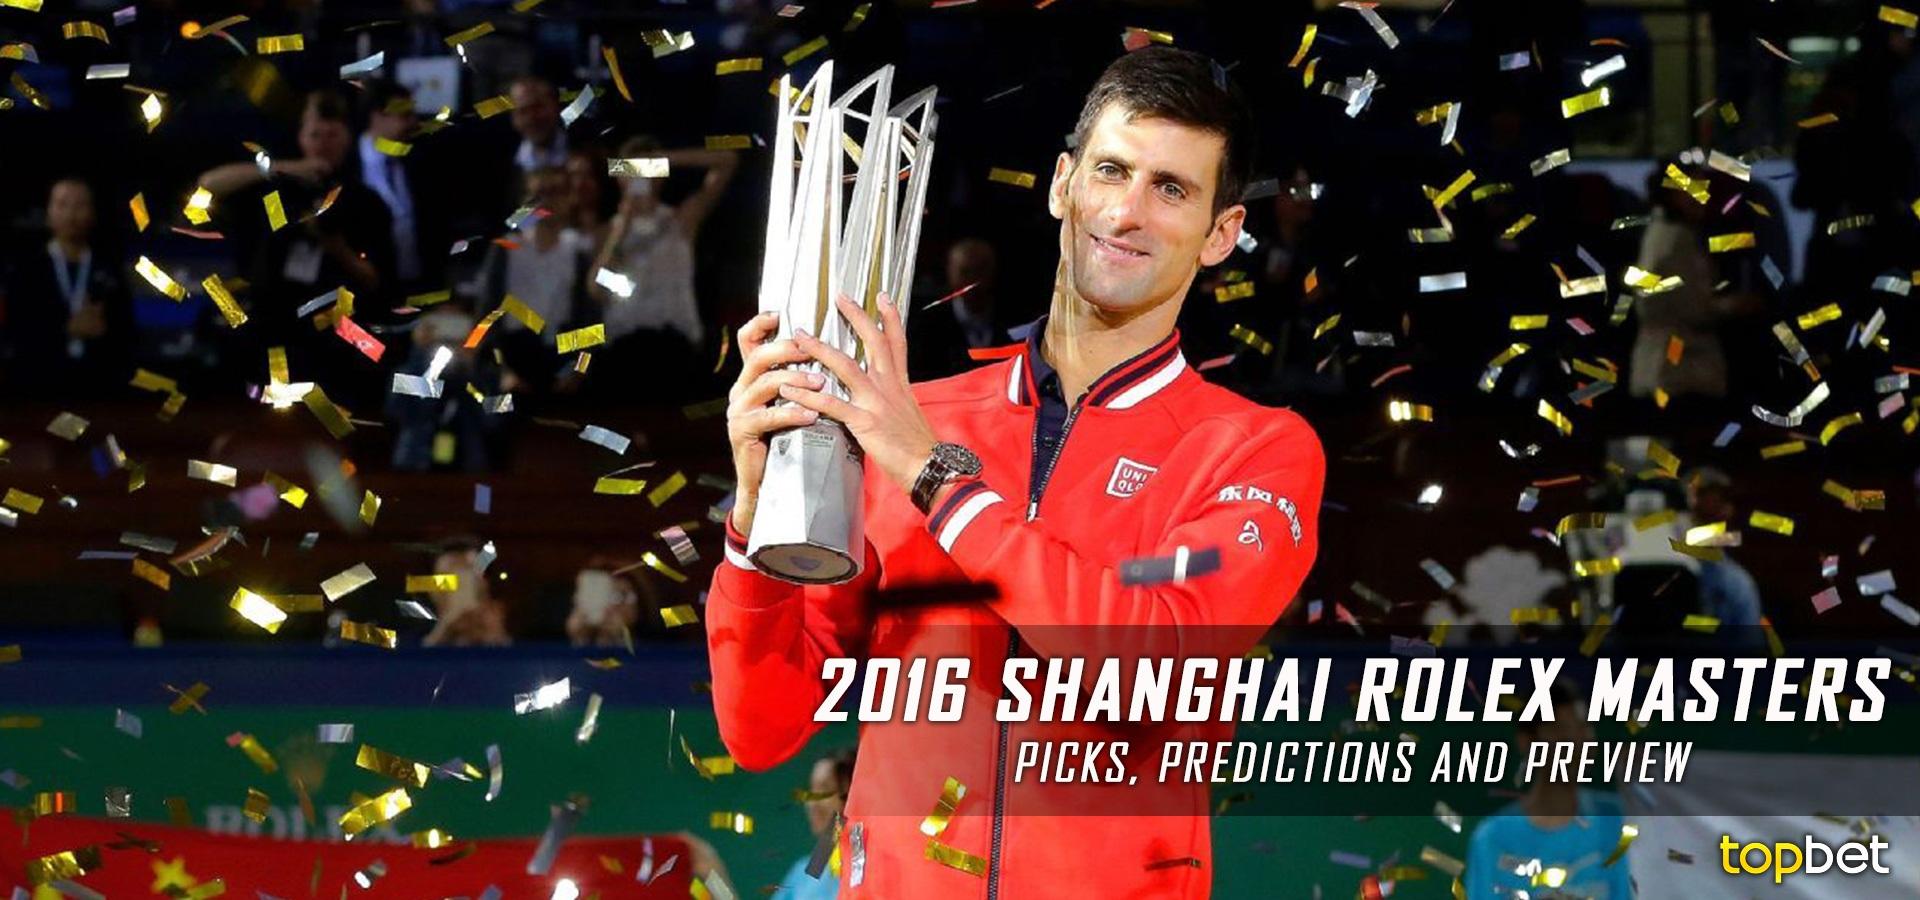 2016 ATP Shanghai Rolex Masters Predictions, Picks & Preview